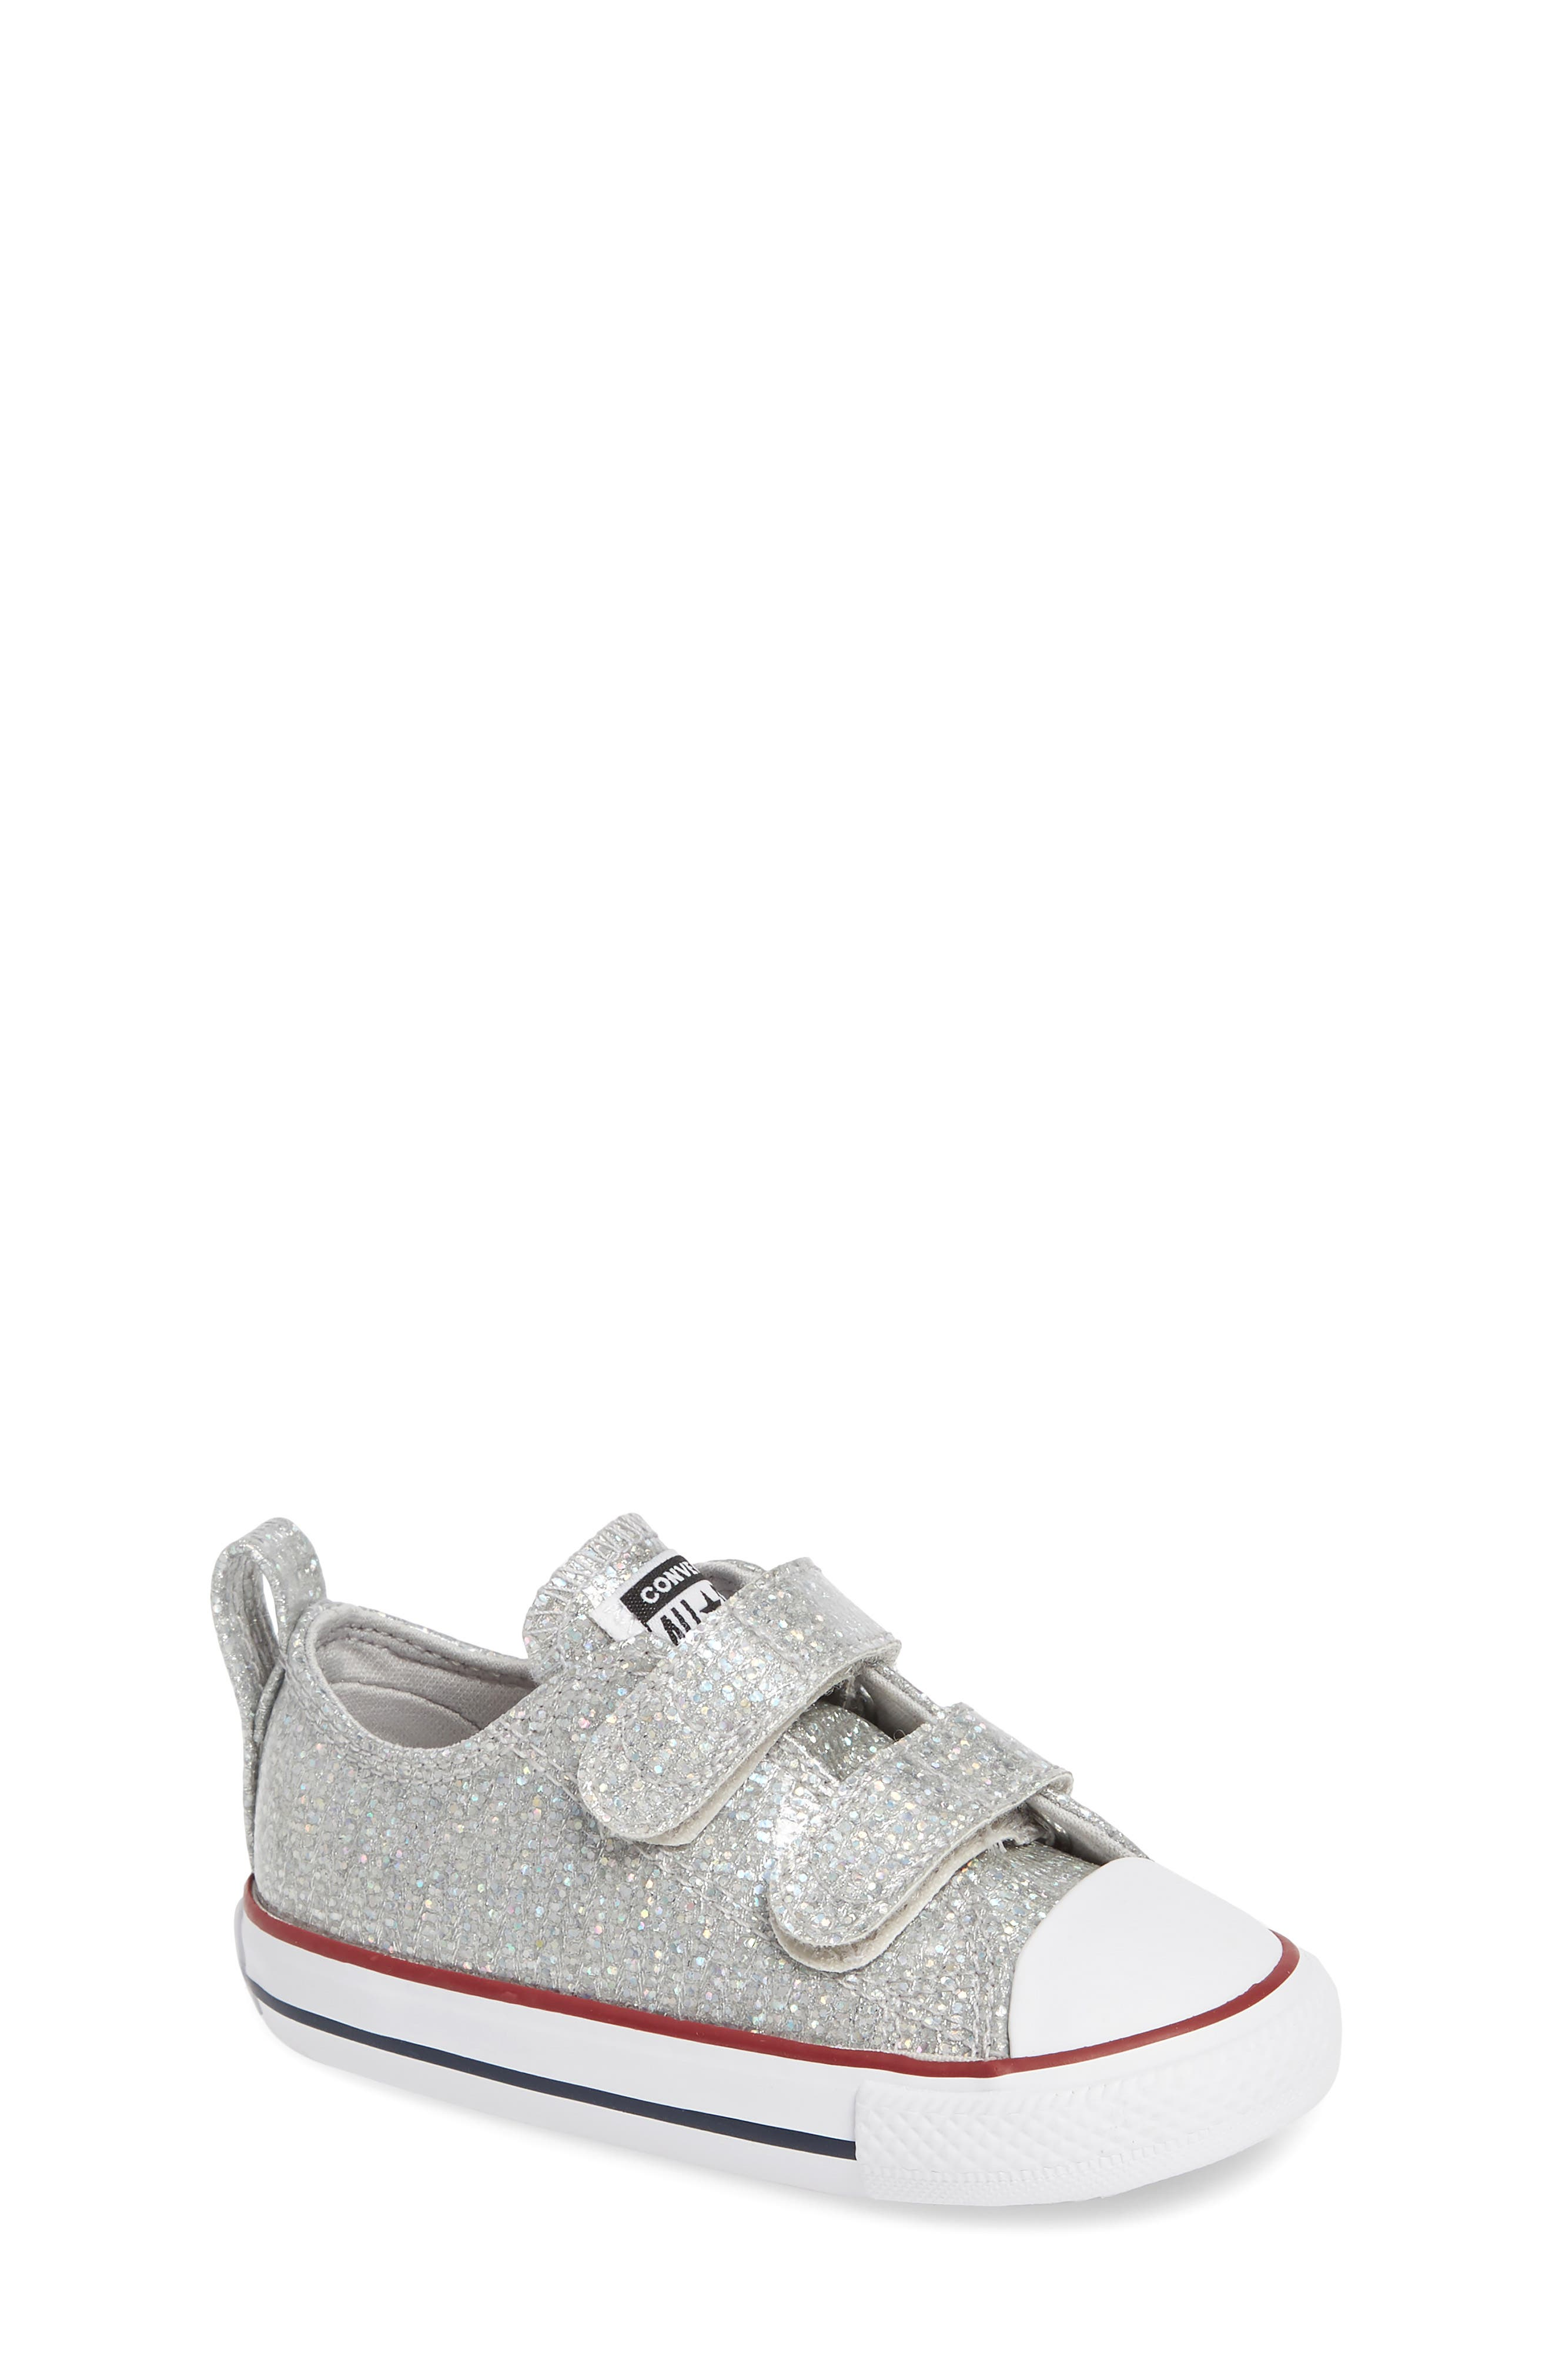 All Star<sup>®</sup> Seasonal Glitter Sneaker,                             Main thumbnail 1, color,                             050